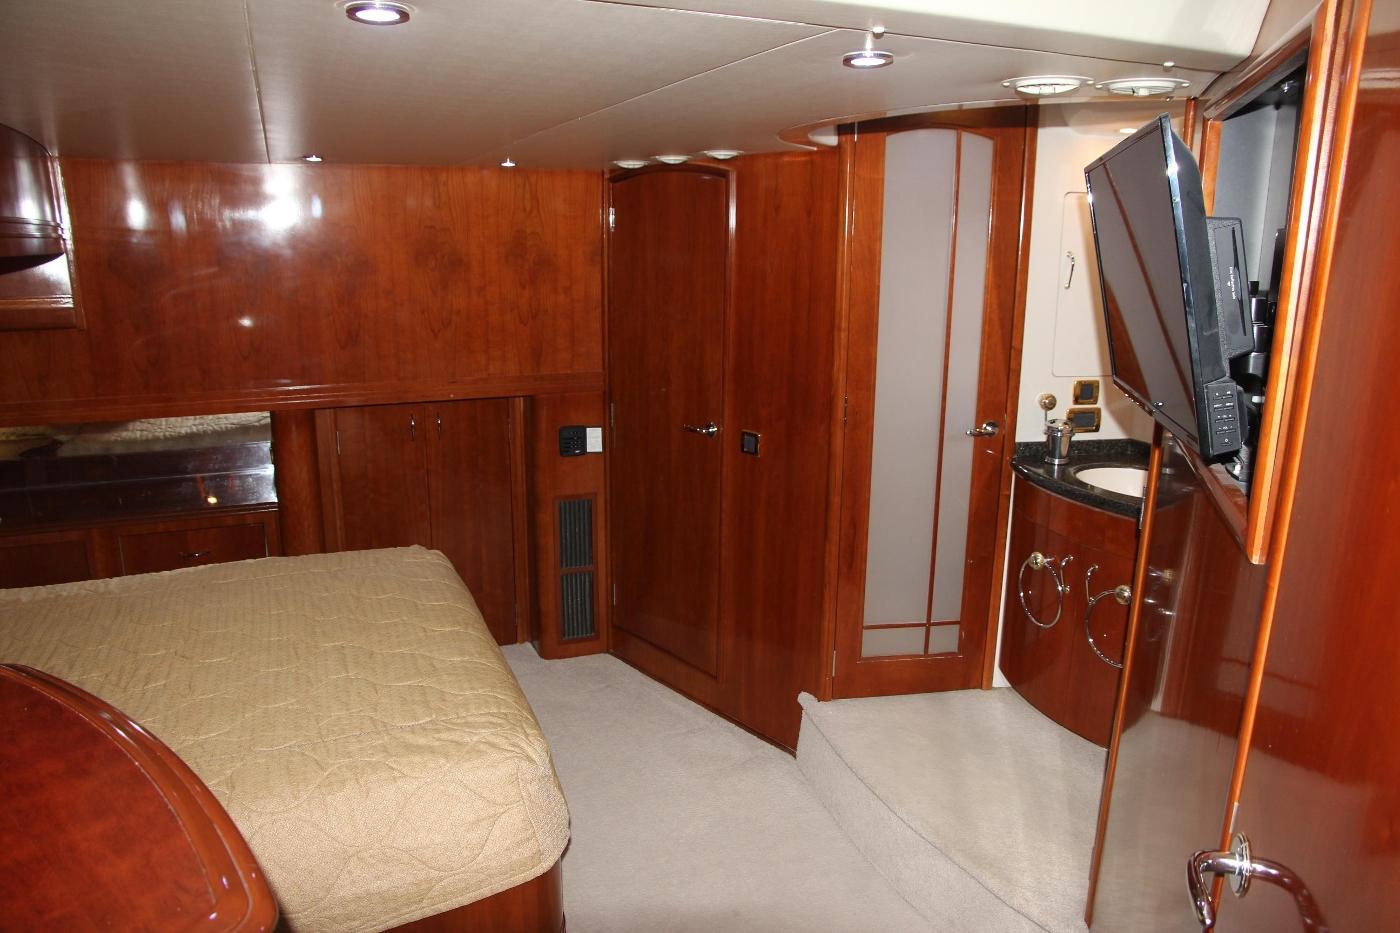 2005 Carver 560 Voyager Pilothouse, Master Stateroom